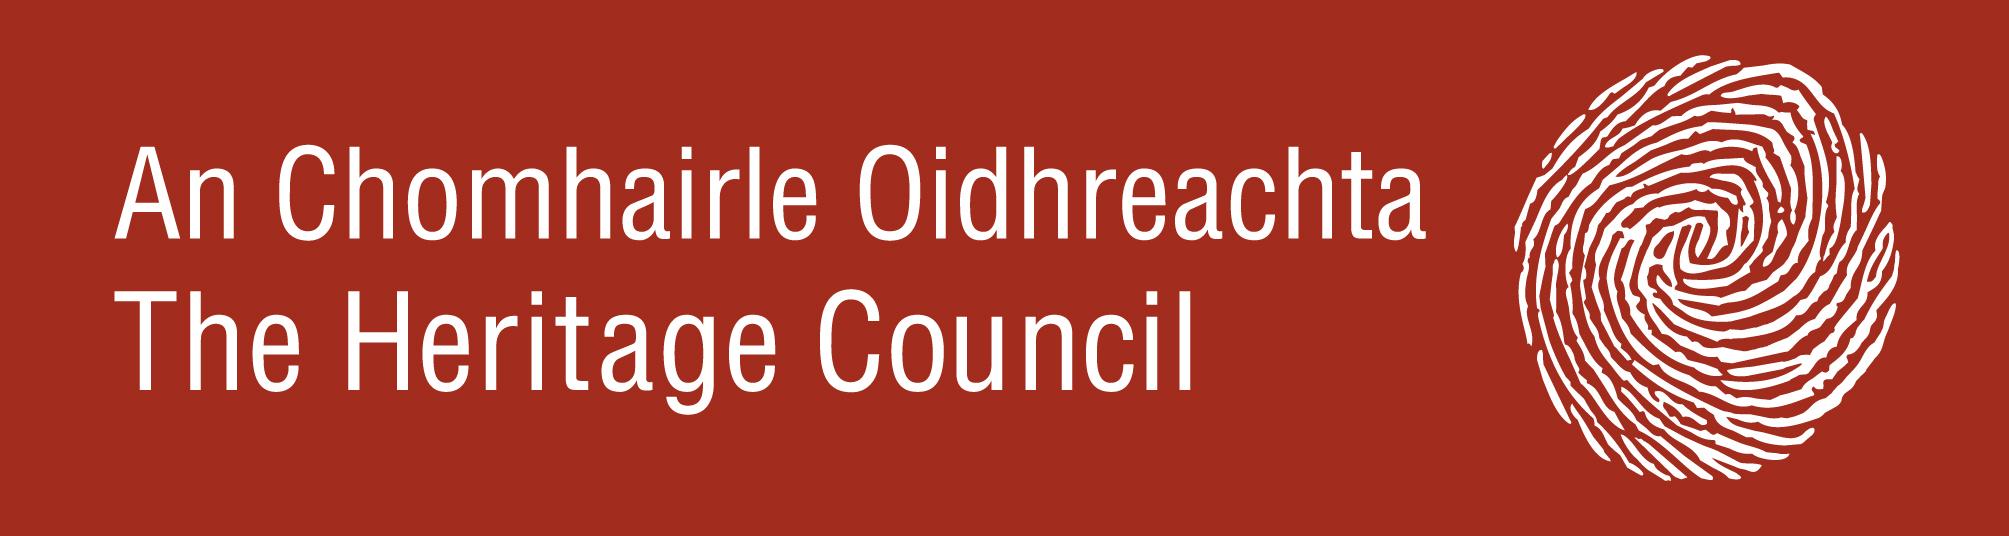 Heritage-Council-Logo.jpg#asset:15233